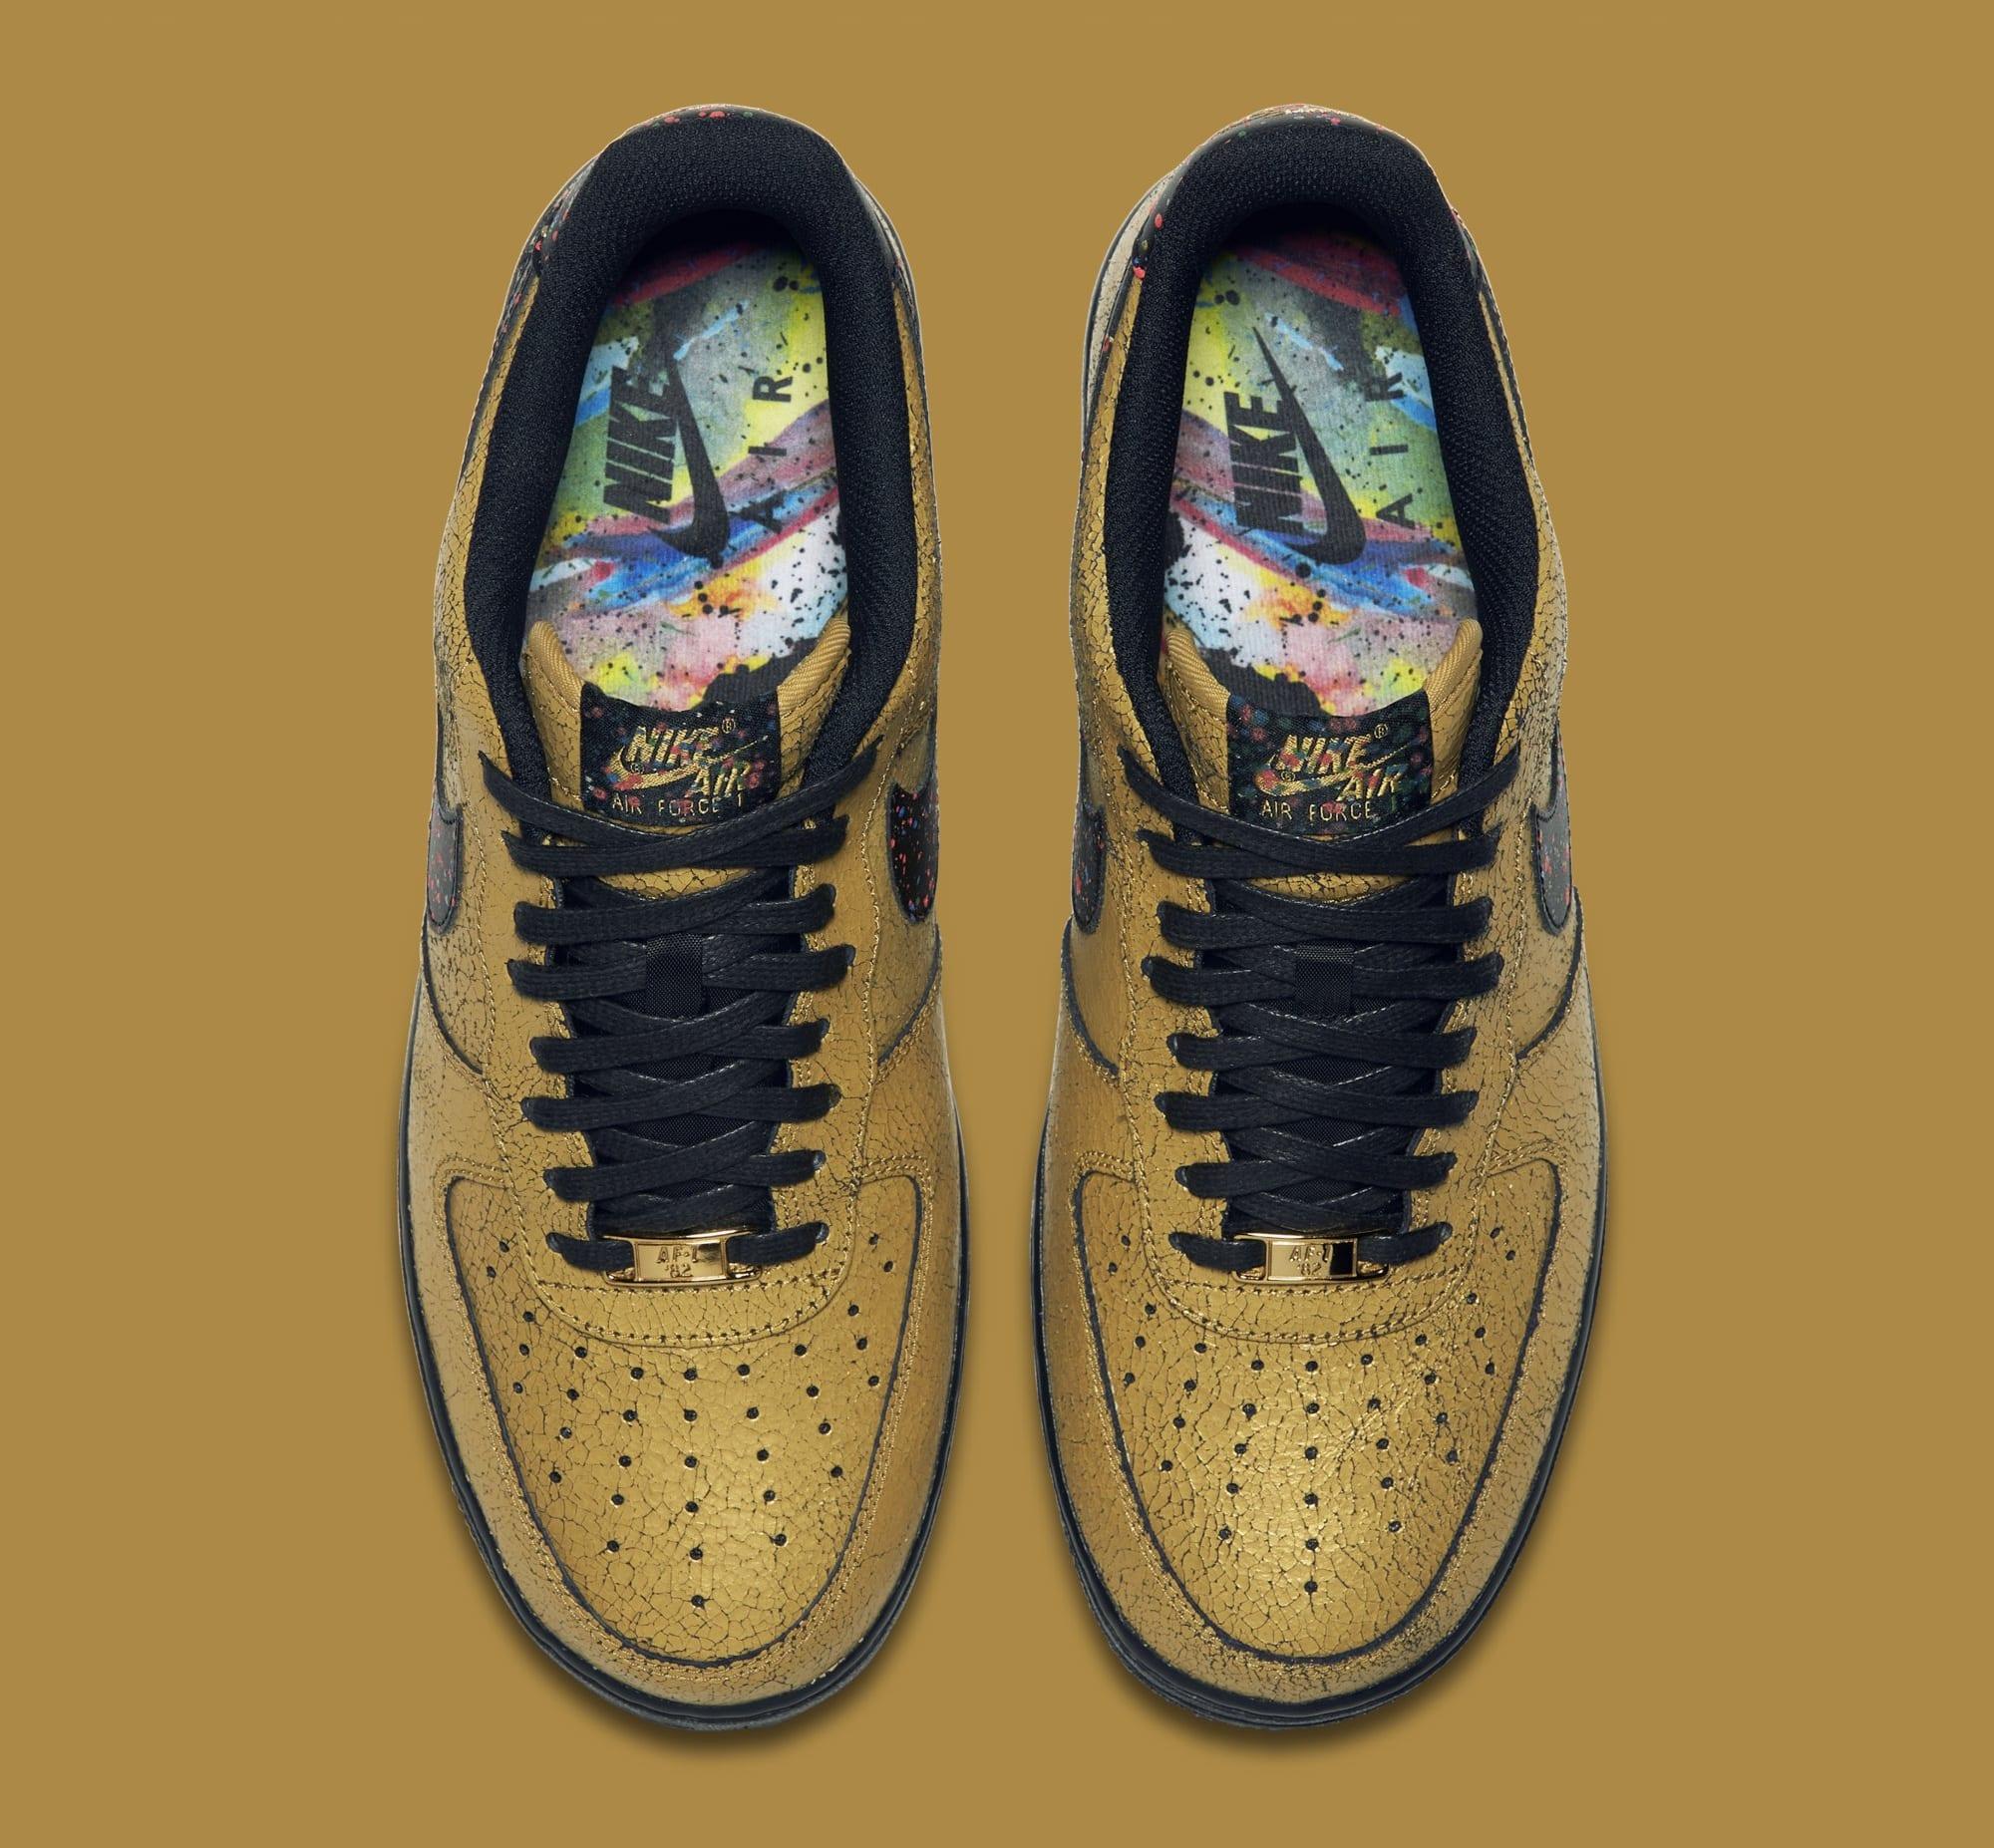 separation shoes 83d9e be588 ... new zealand image via nike nike air force 1 low caribana top 5f192 205a4